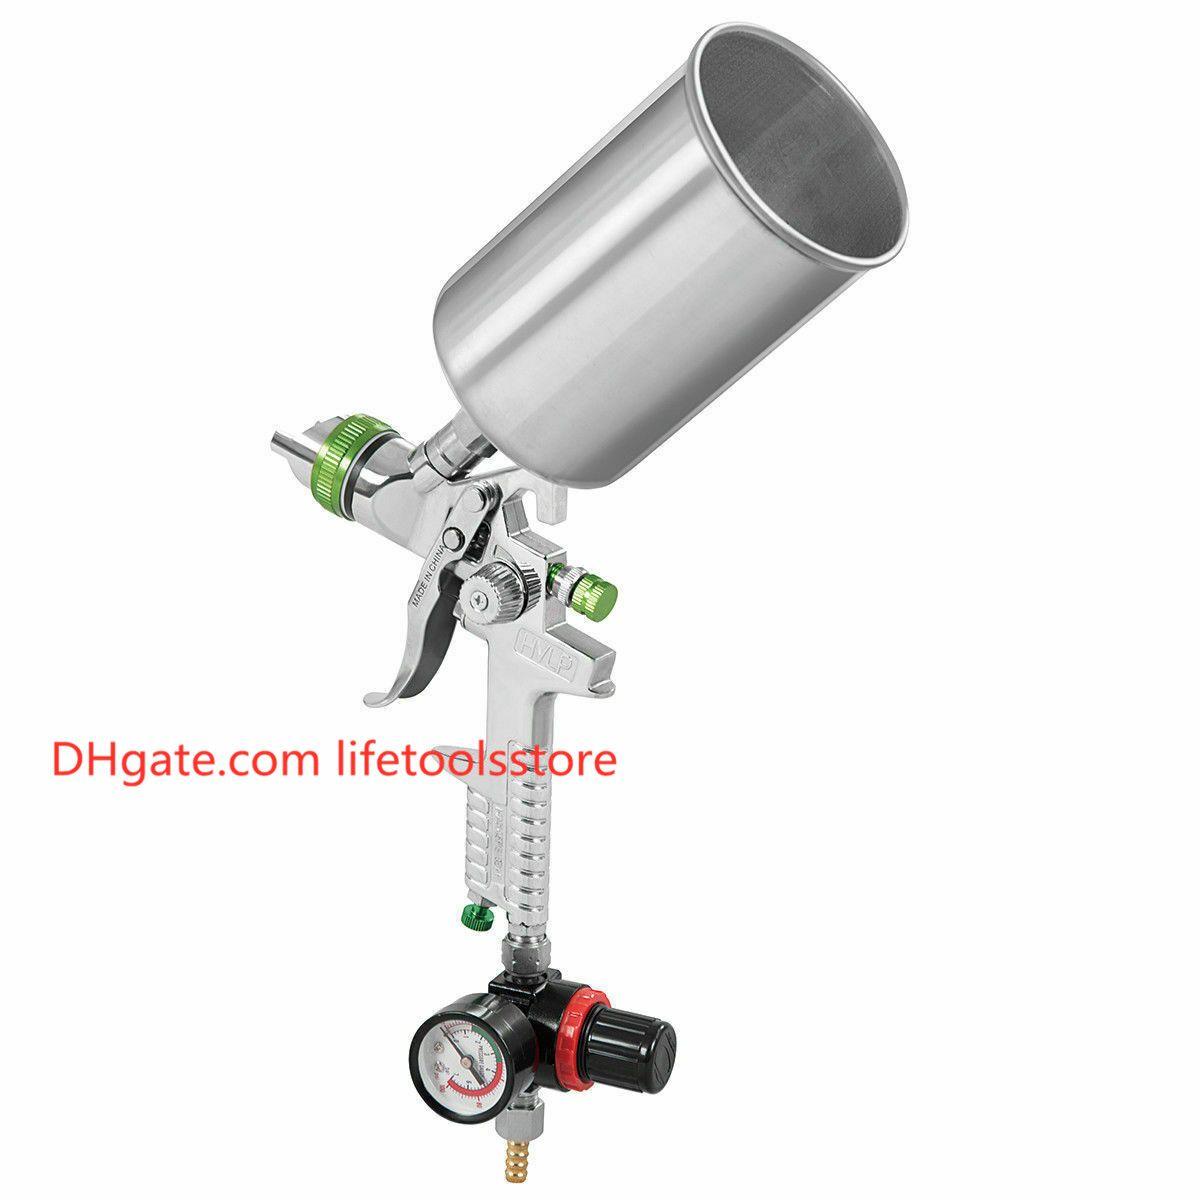 Satin Al H 827 Hava Regulatoru Ile Airbrush 2 5mm Meme Profesyonel